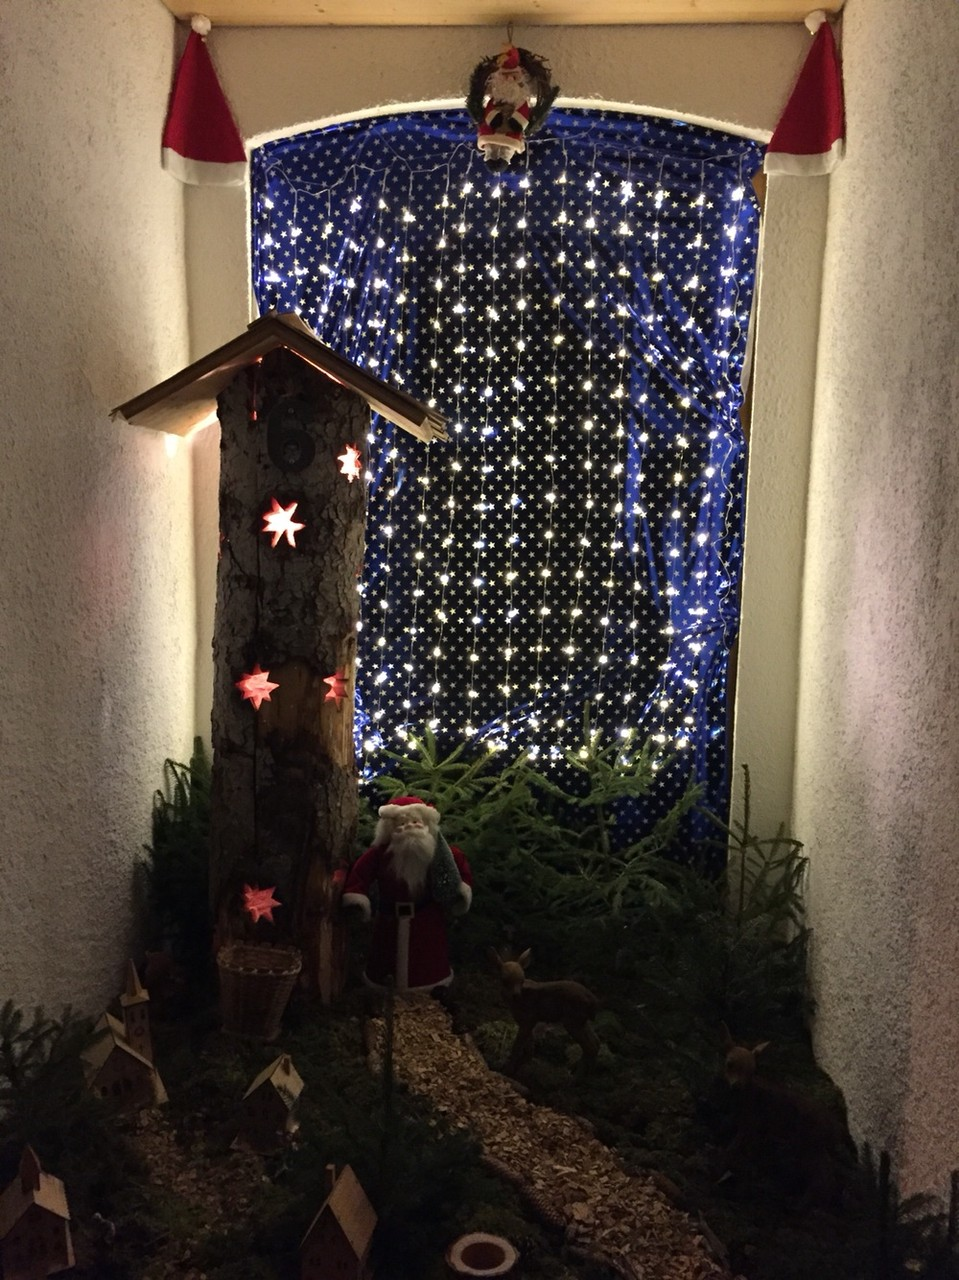 Adventsfenster 2015 Thürler Yvonne, Tossenstrasse 26, Im Fang